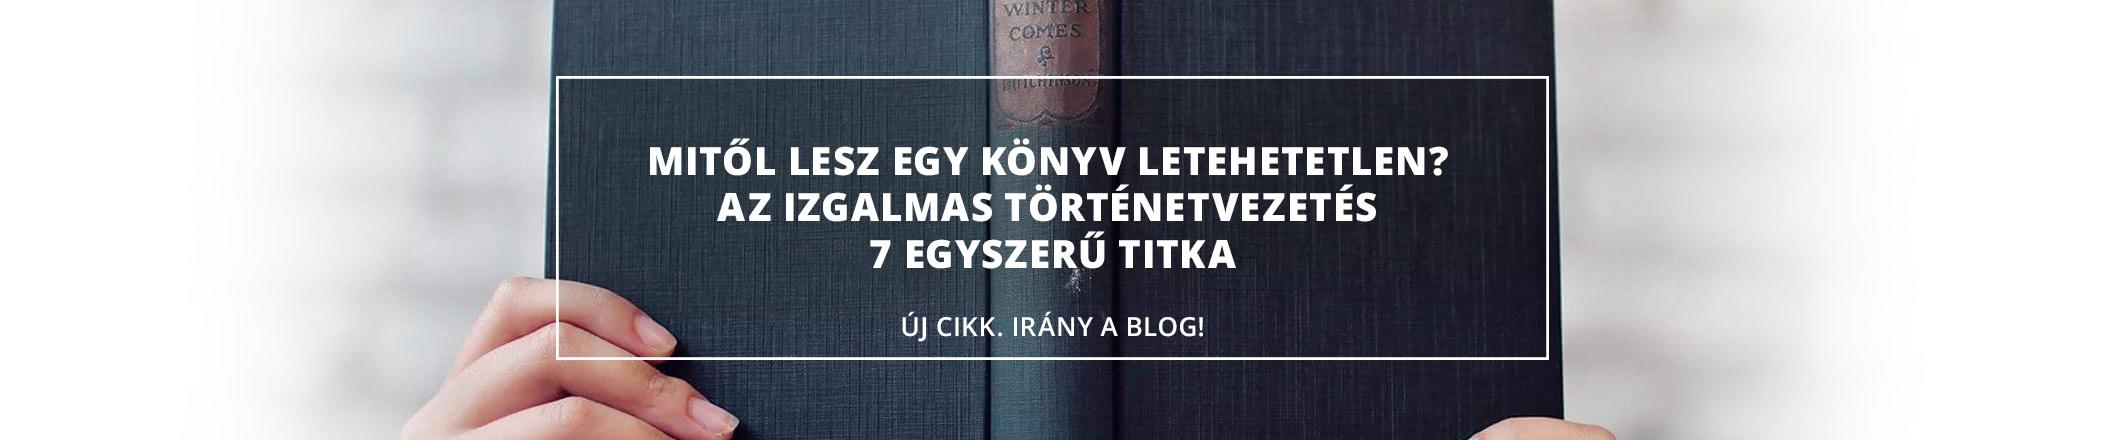 mybook_blogpost_201803_slide